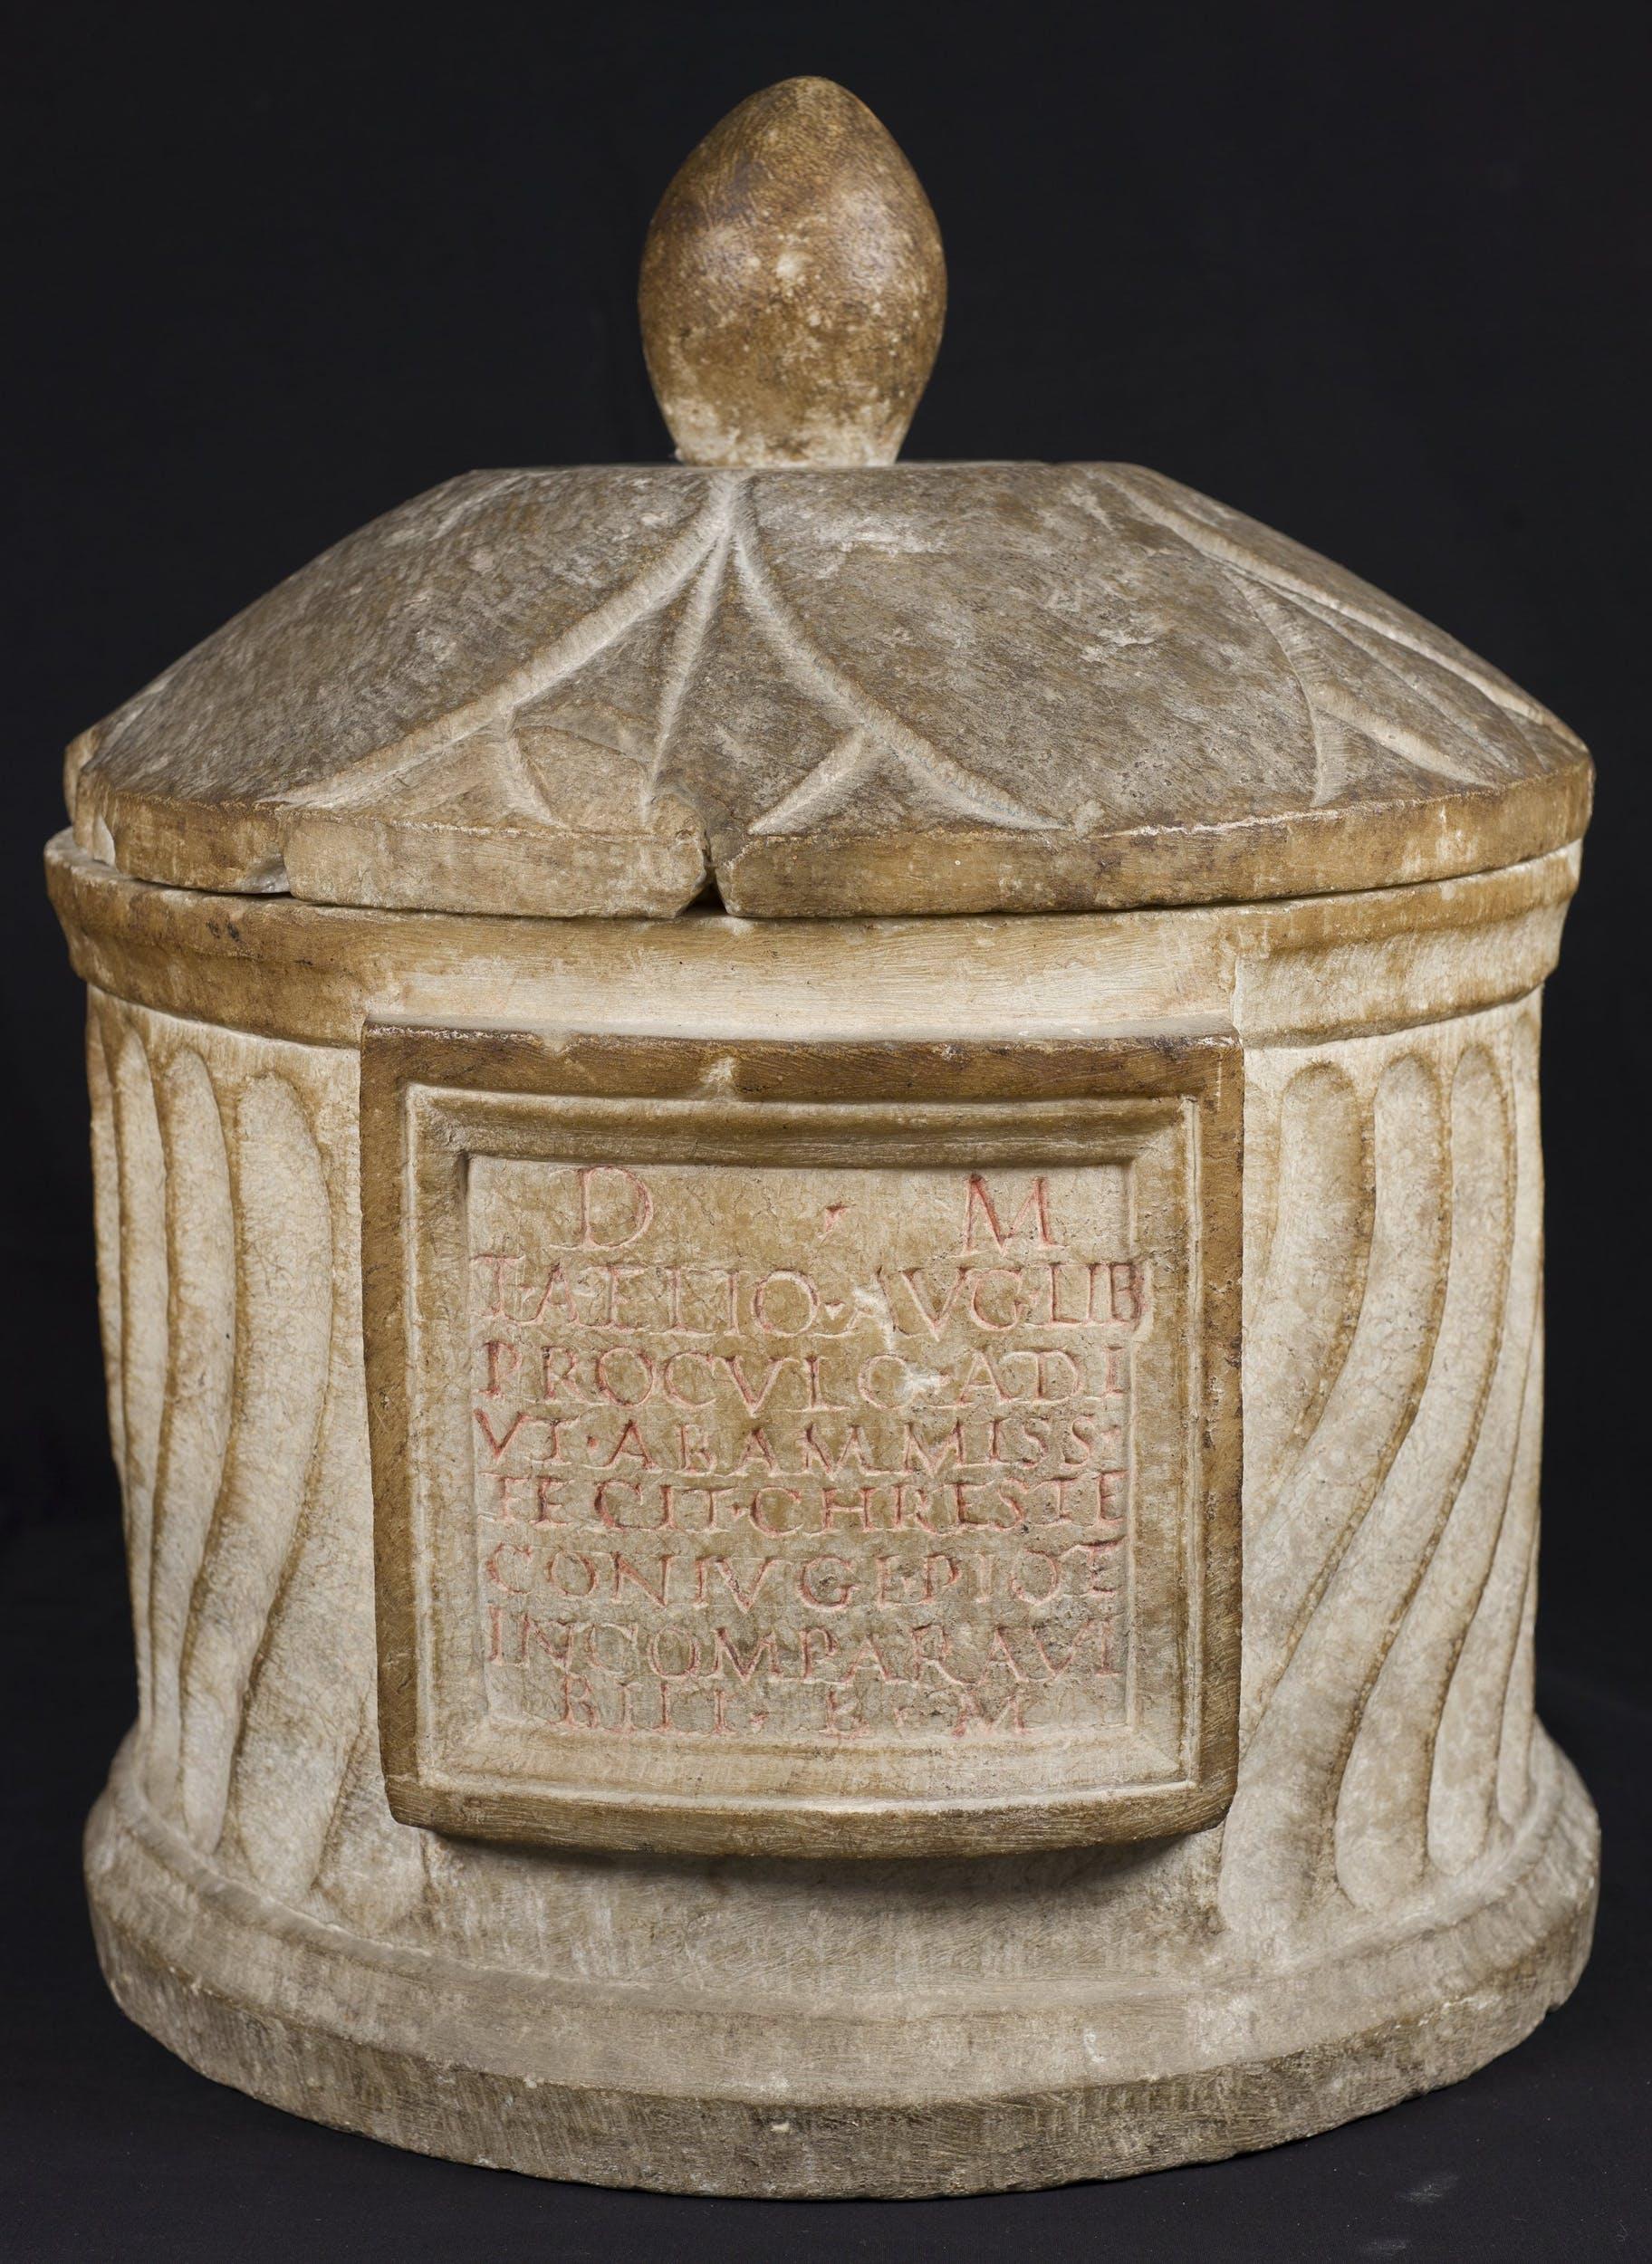 Mostra (Auditorium Vasari), Tutti gli uomini dell'Imperatore